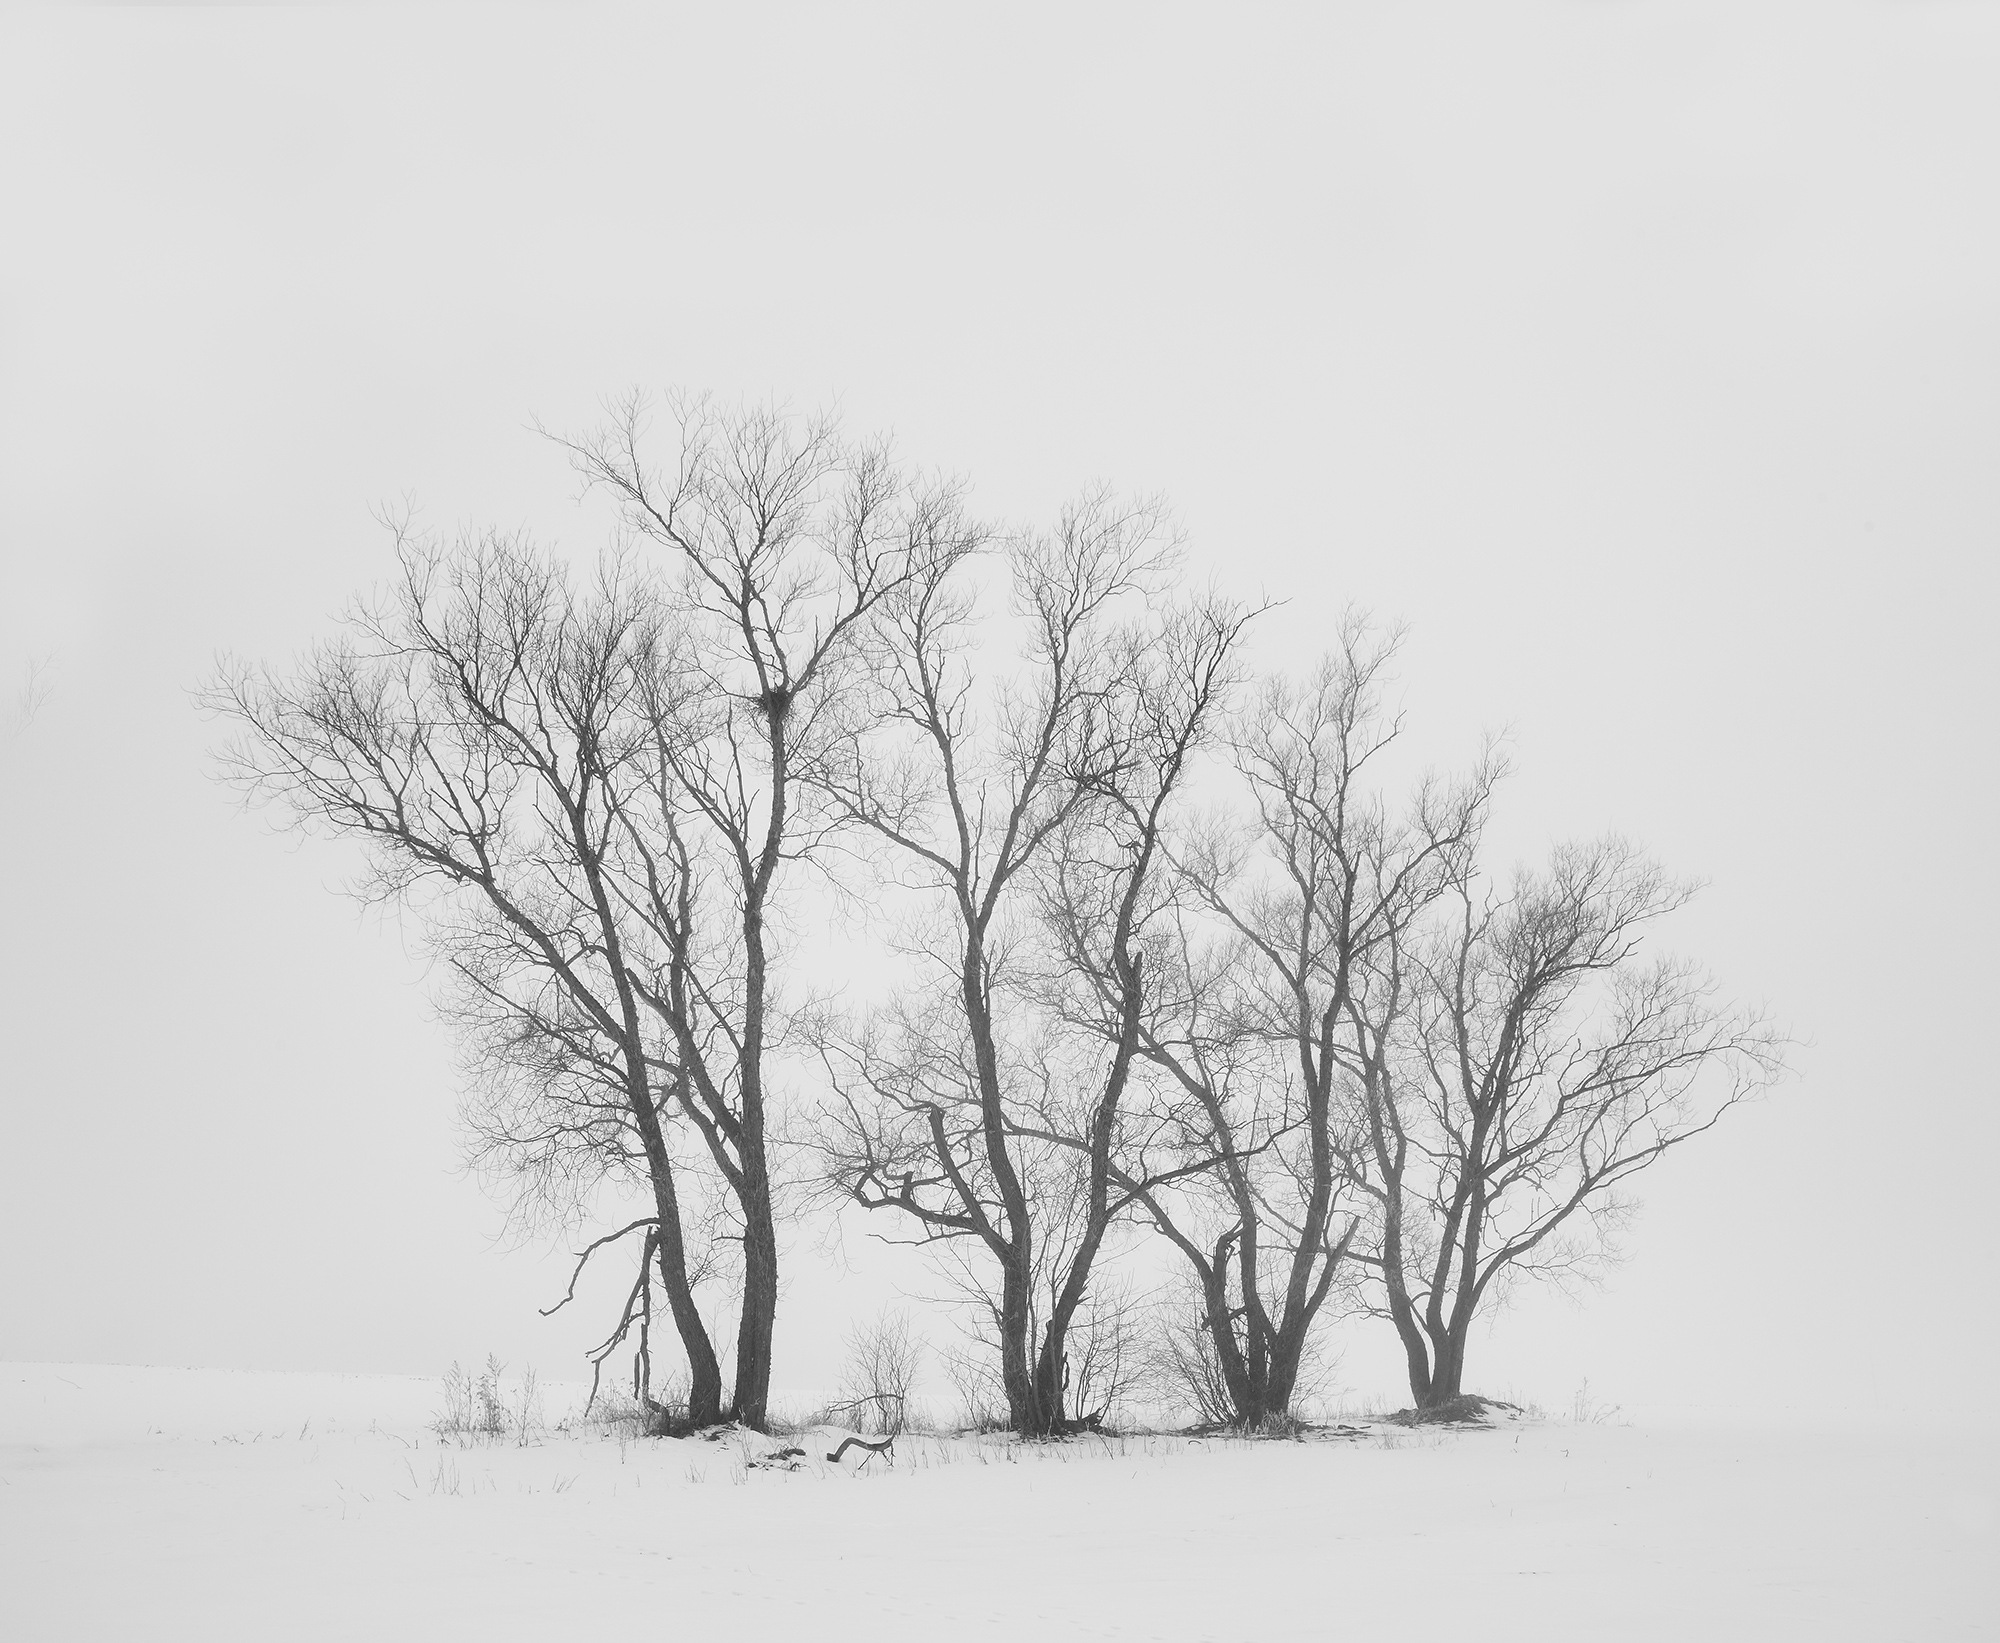 Crow's nest by Arnis Krumins